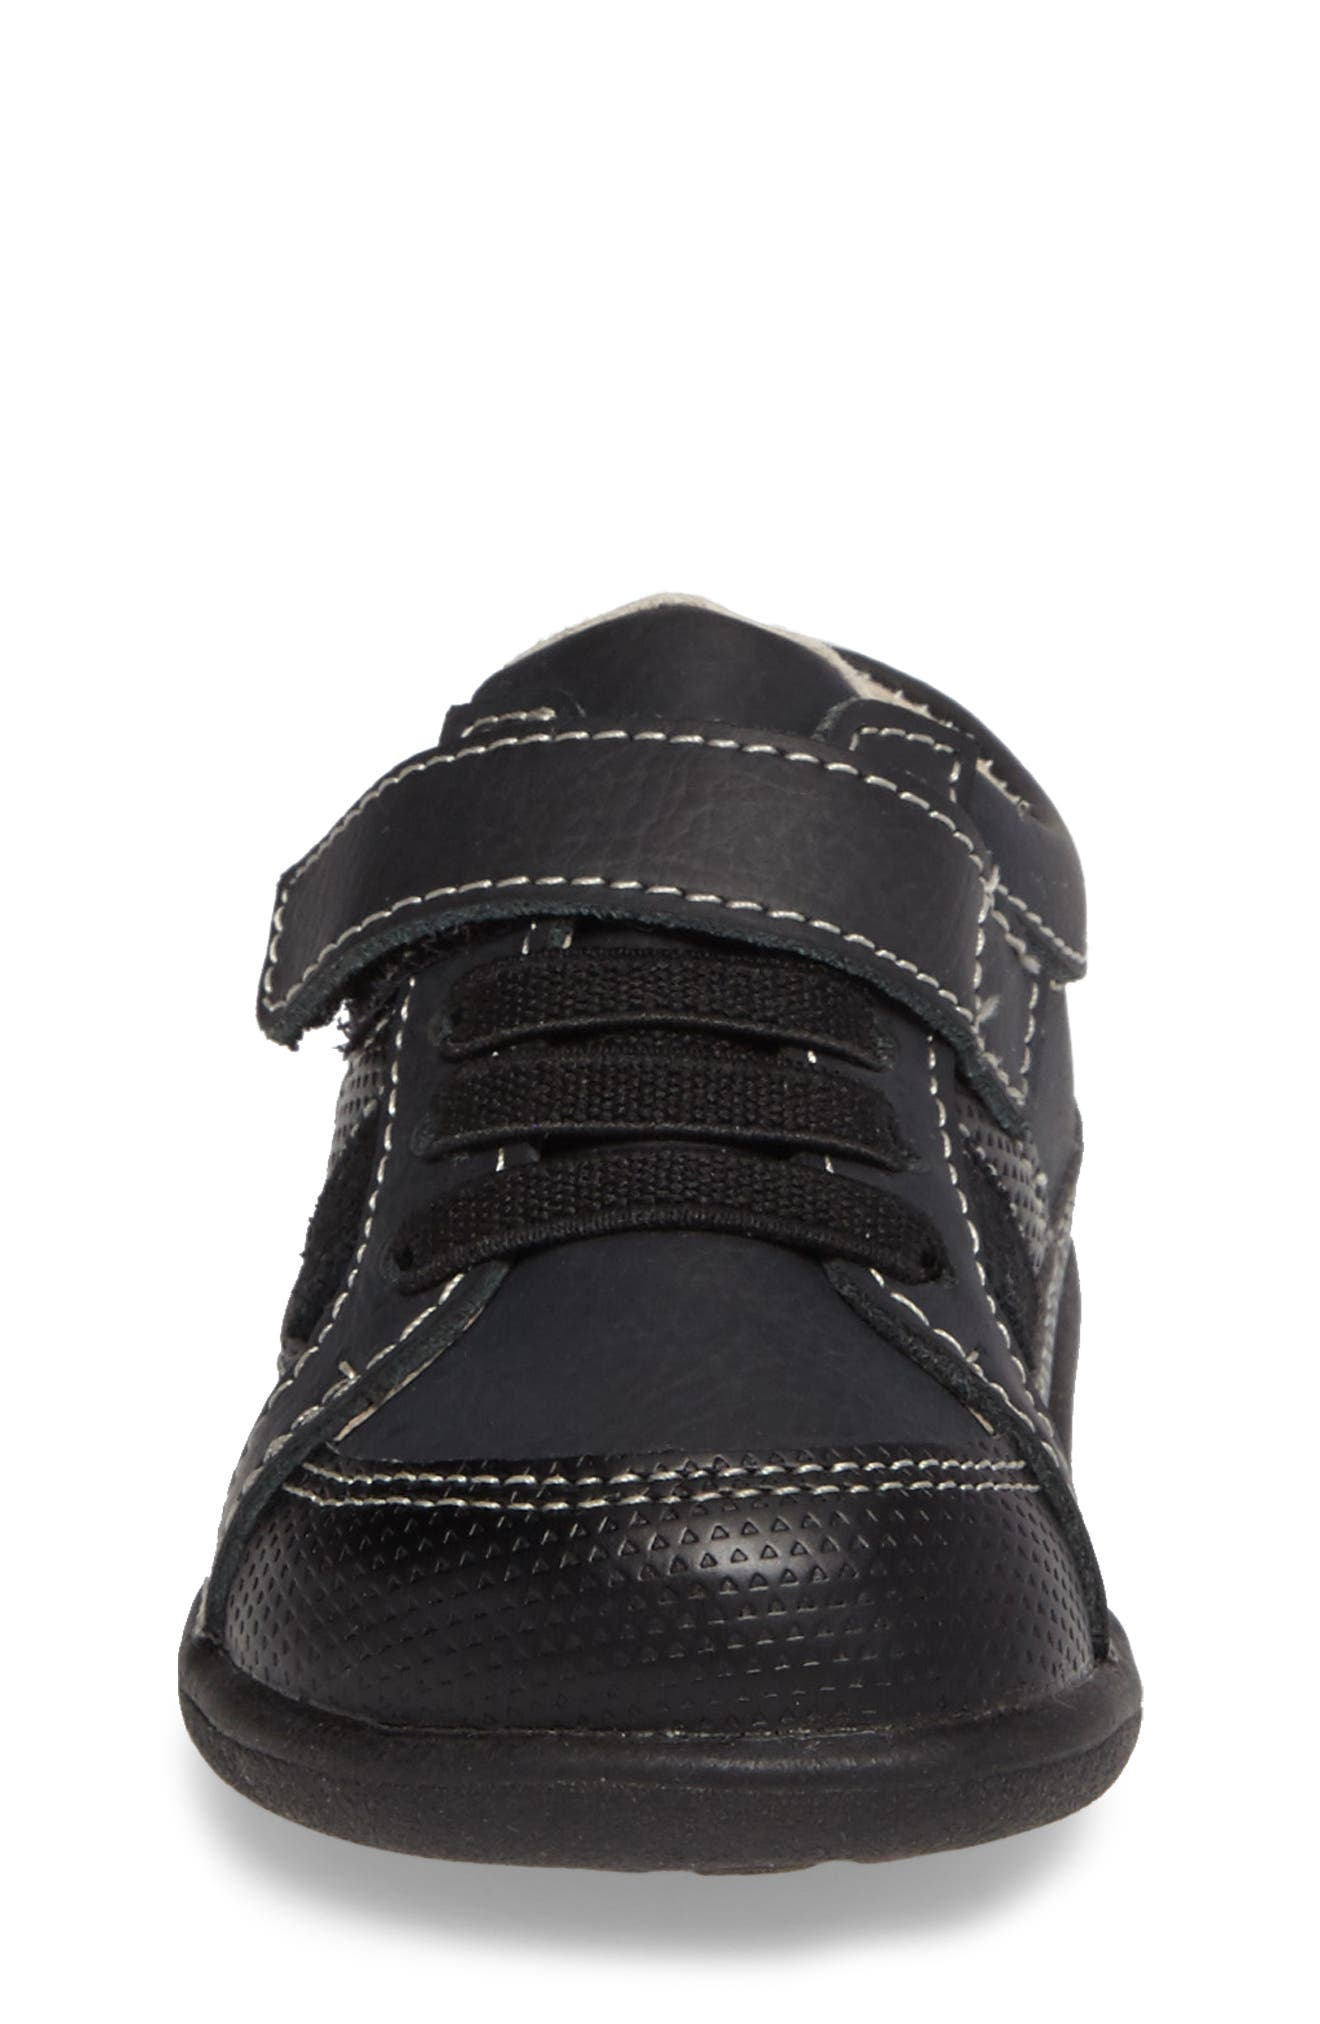 Randall II Sneaker,                             Alternate thumbnail 4, color,                             Black